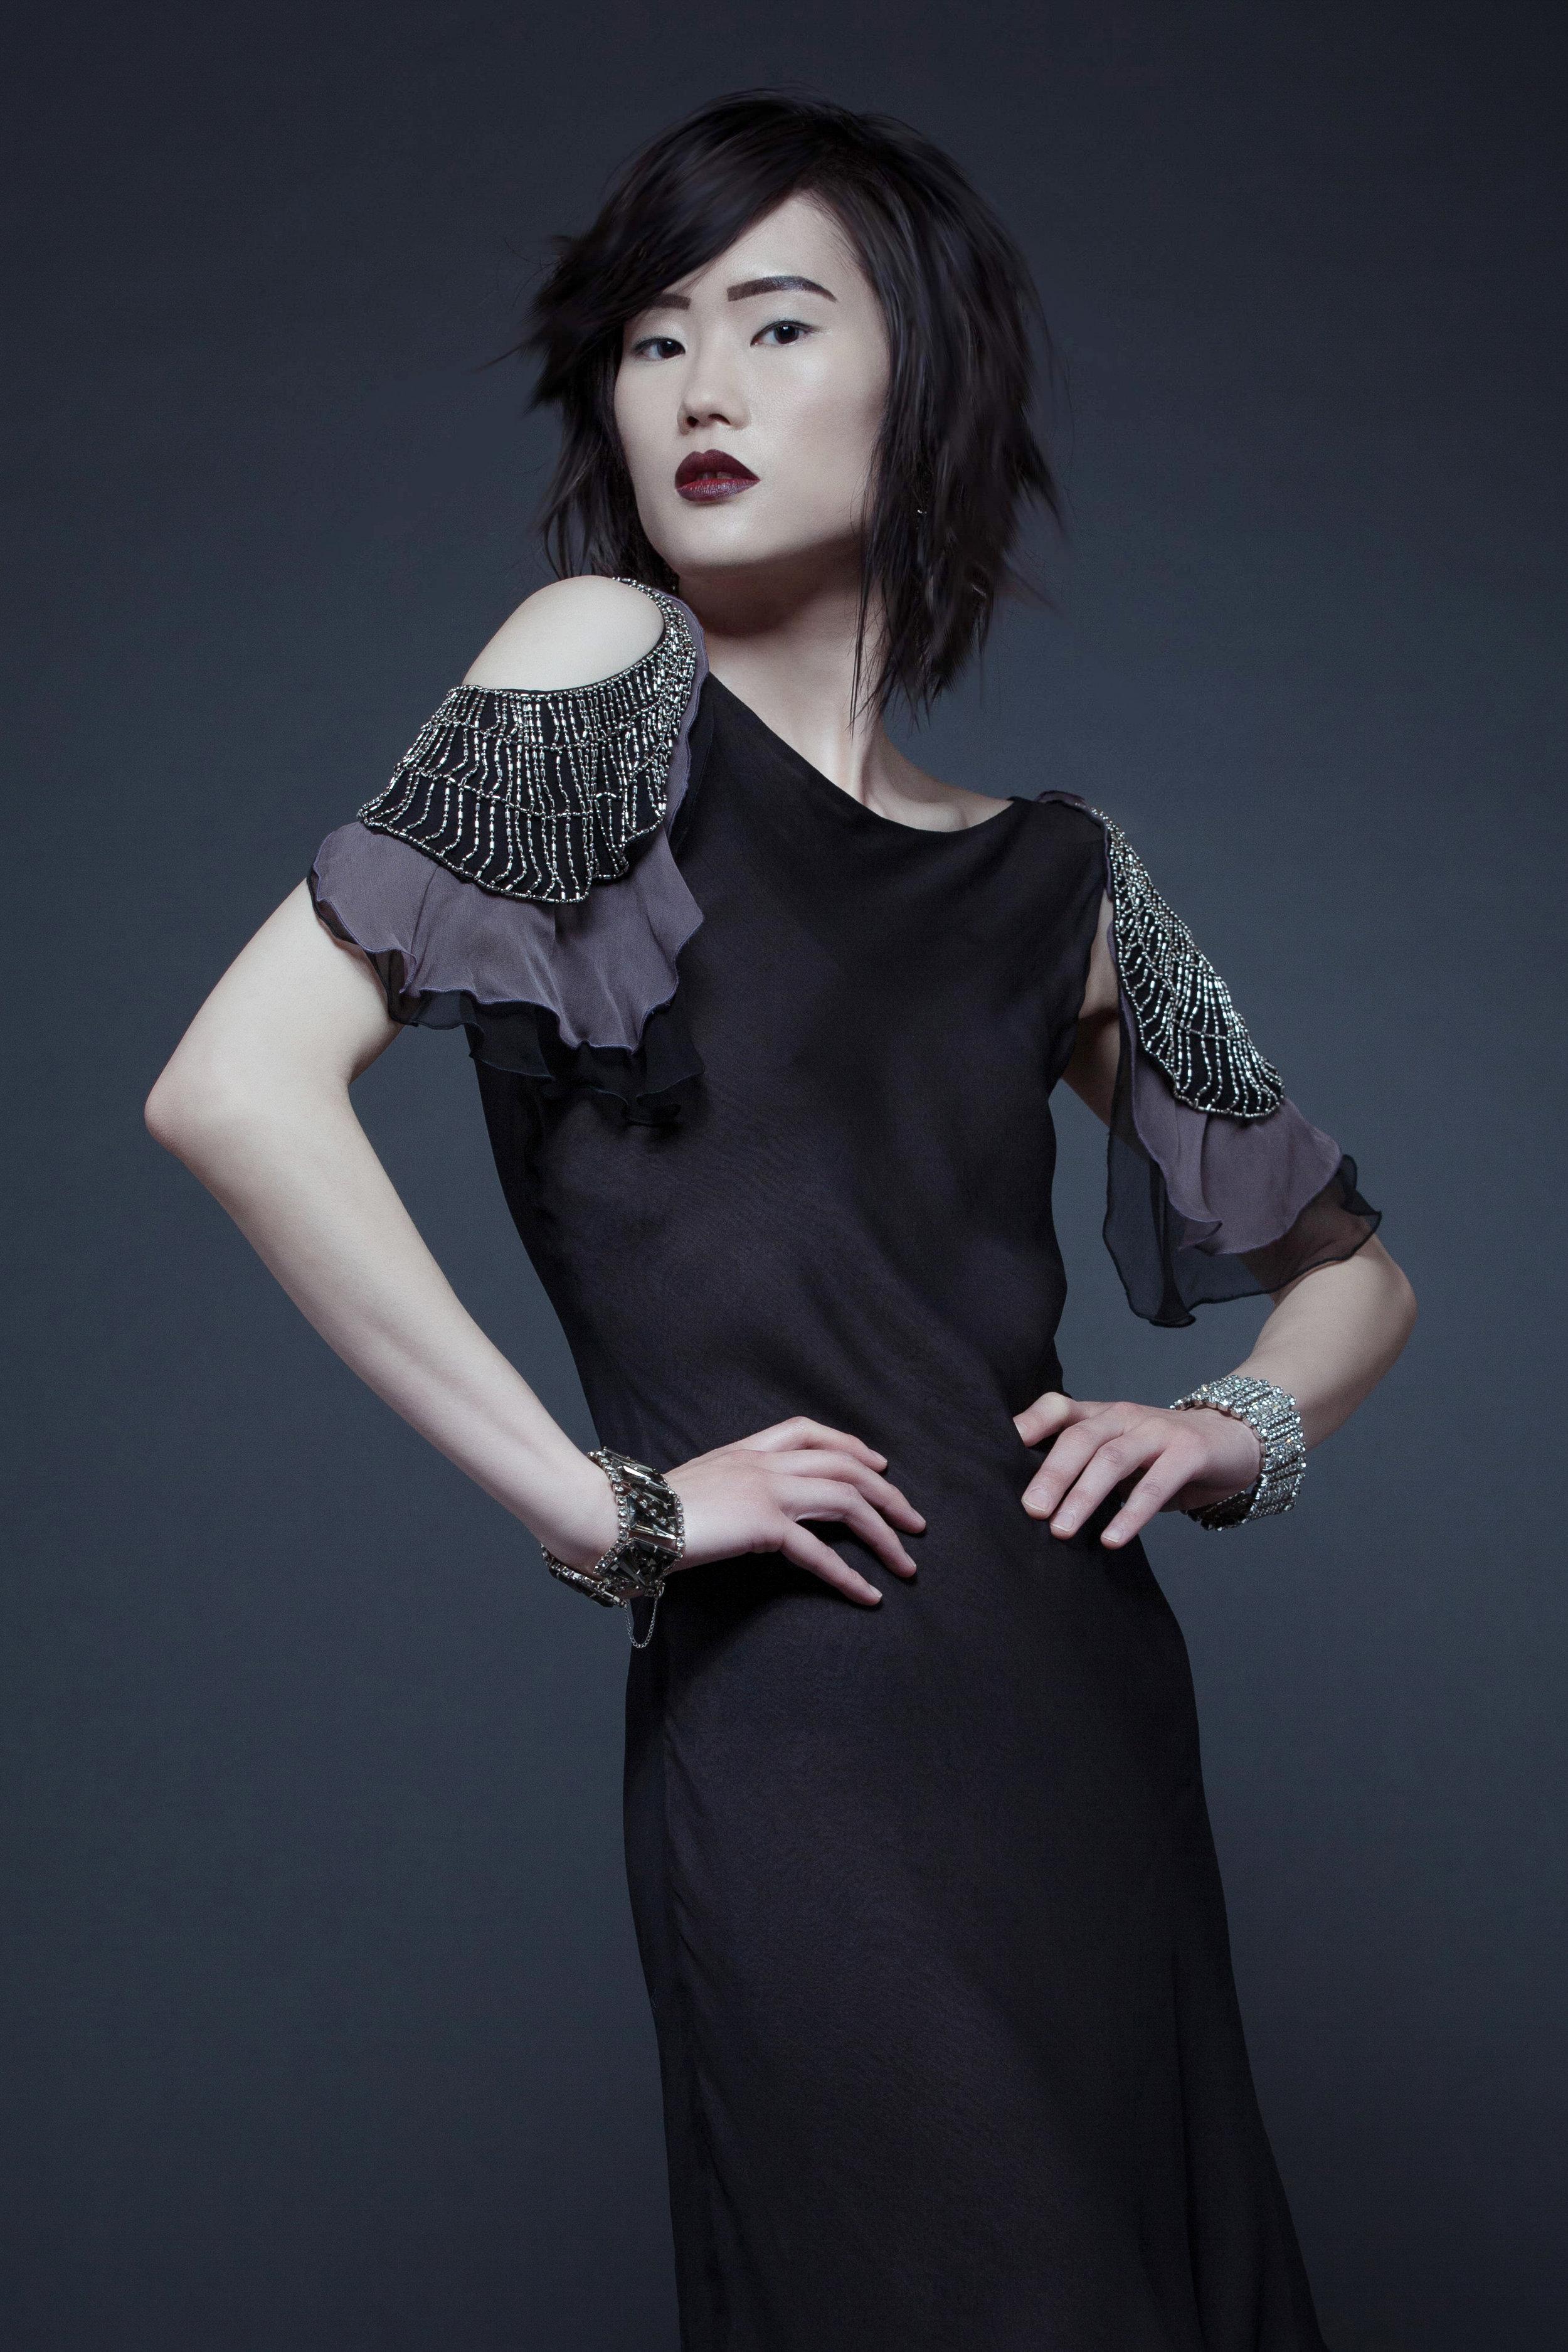 fashion-styling-by-geraldine-duskin-8.jpg